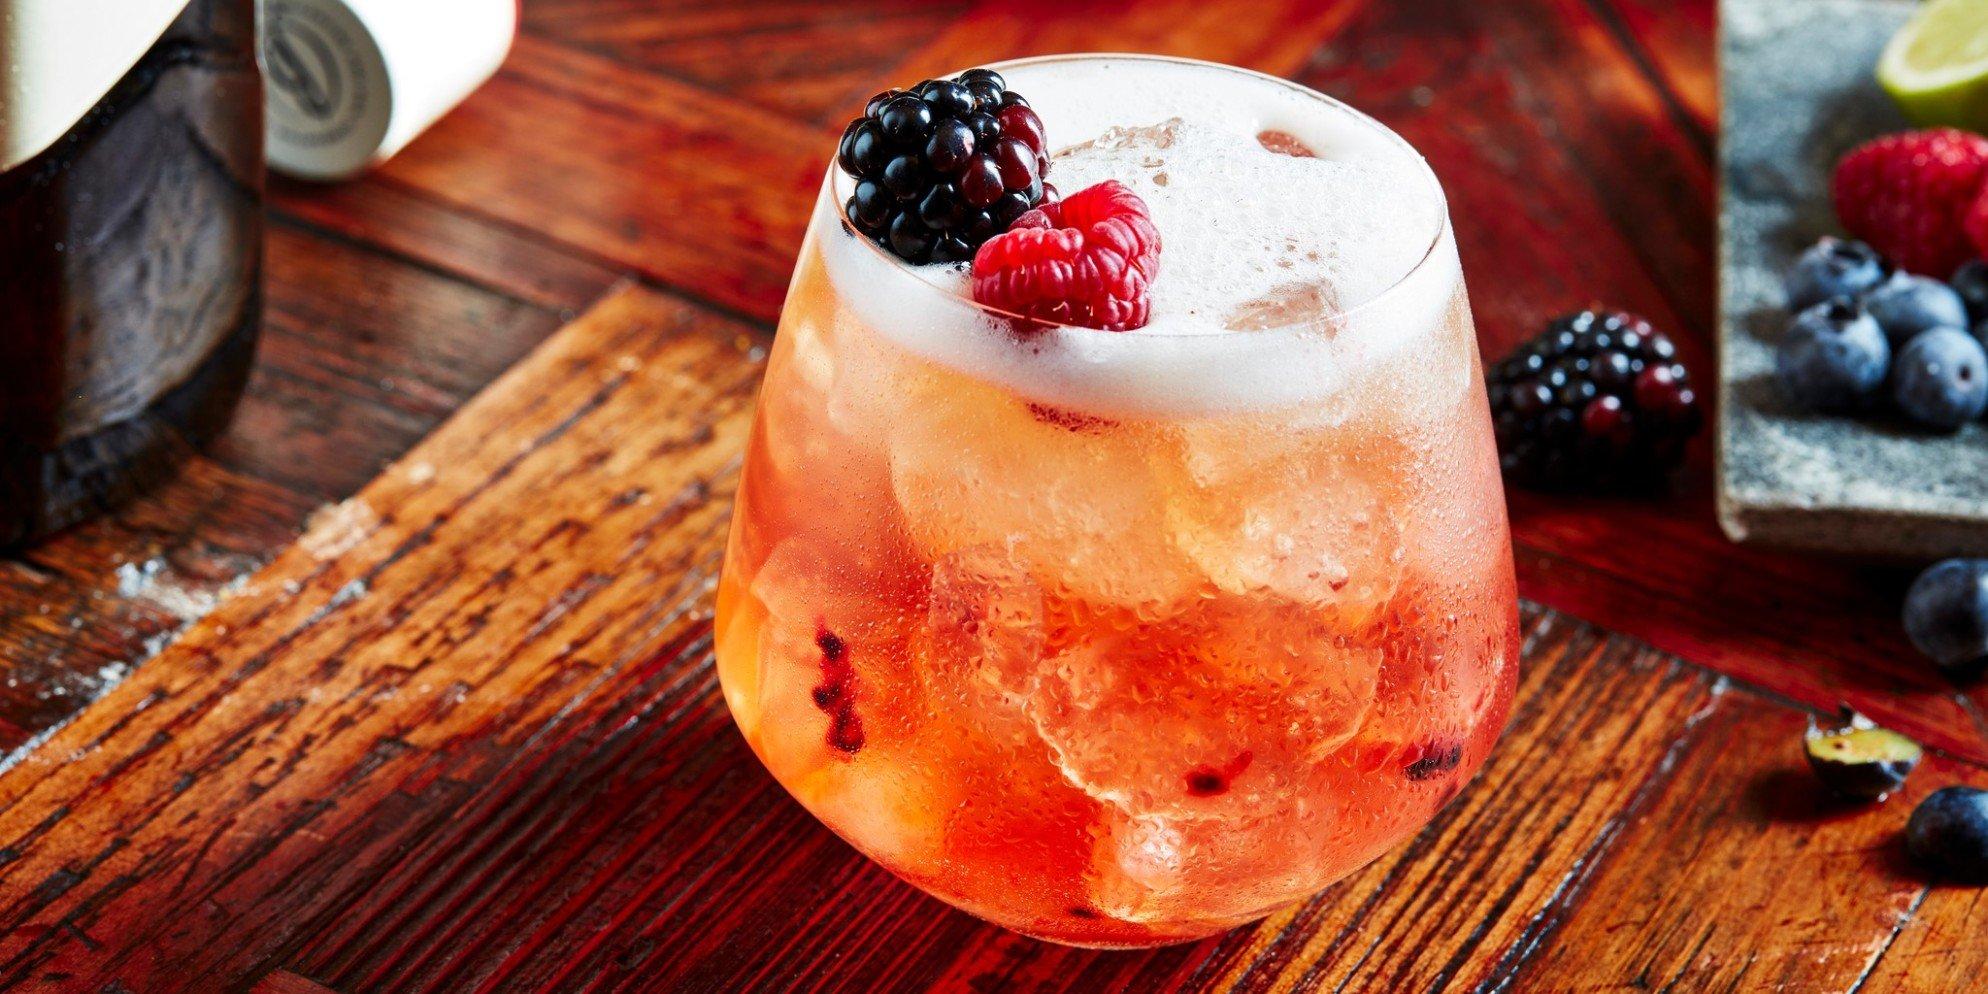 Cócteles de whisky | Stay Berry | Verano | Ballantine's